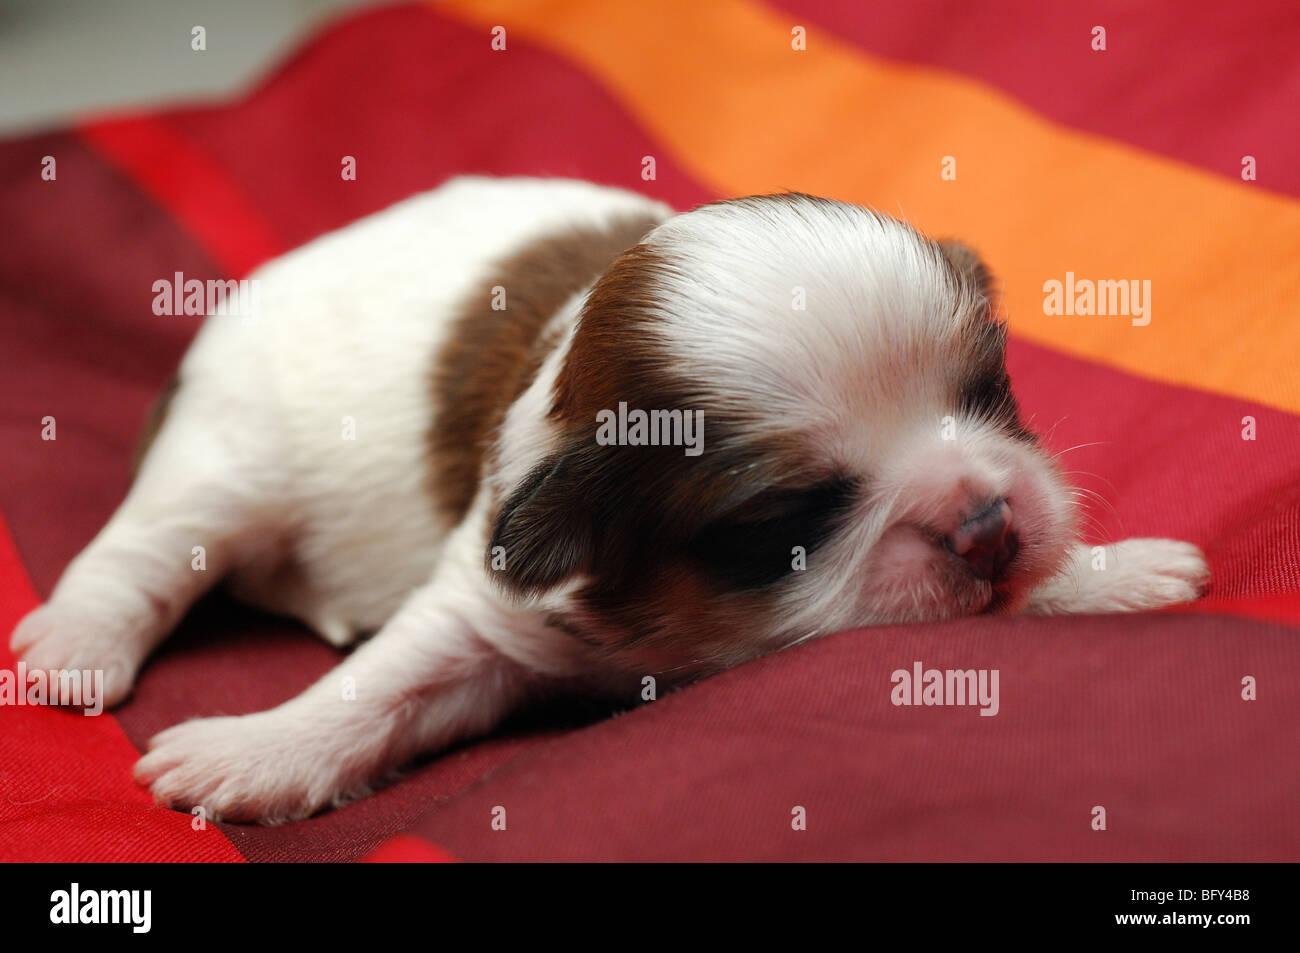 Shih-tzu dog puppy seven days old sleeping - Stock Image